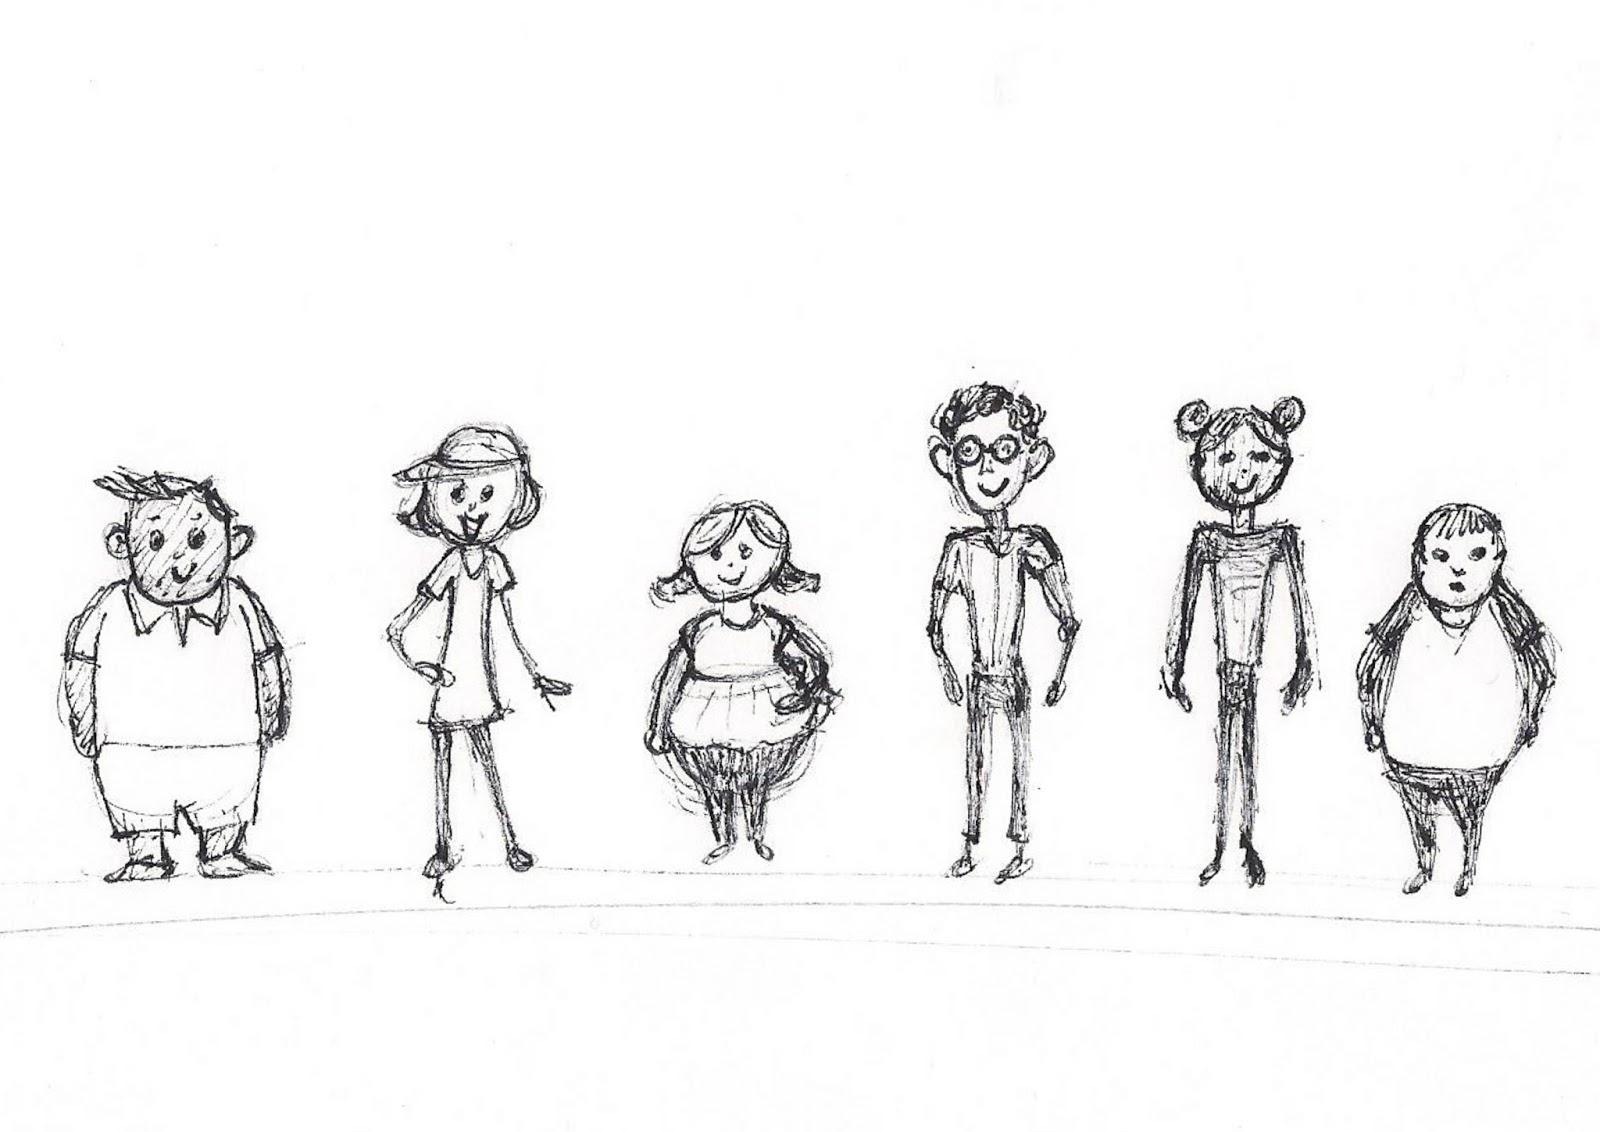 character sketch of annie sullivan